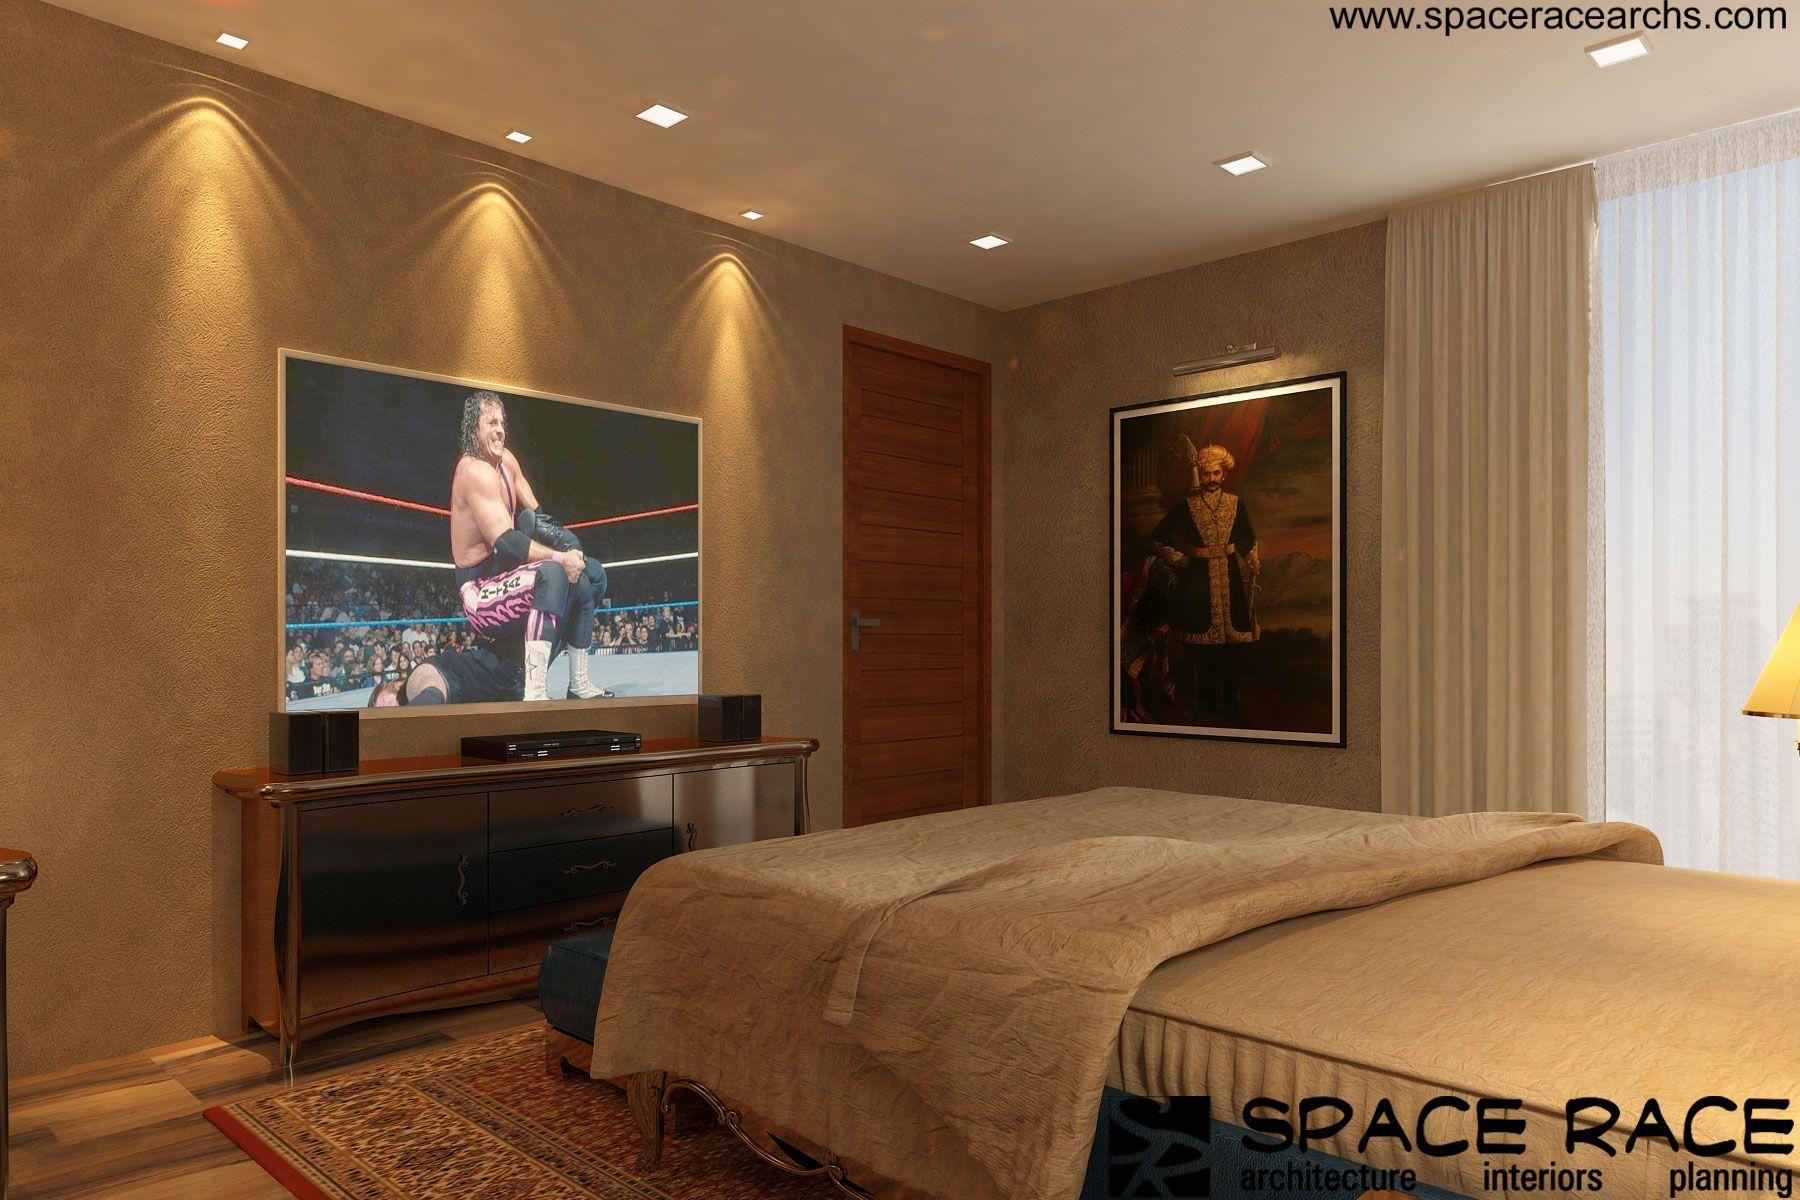 Bedroom Interior Bedroomdecor Interiordesign Homedecor